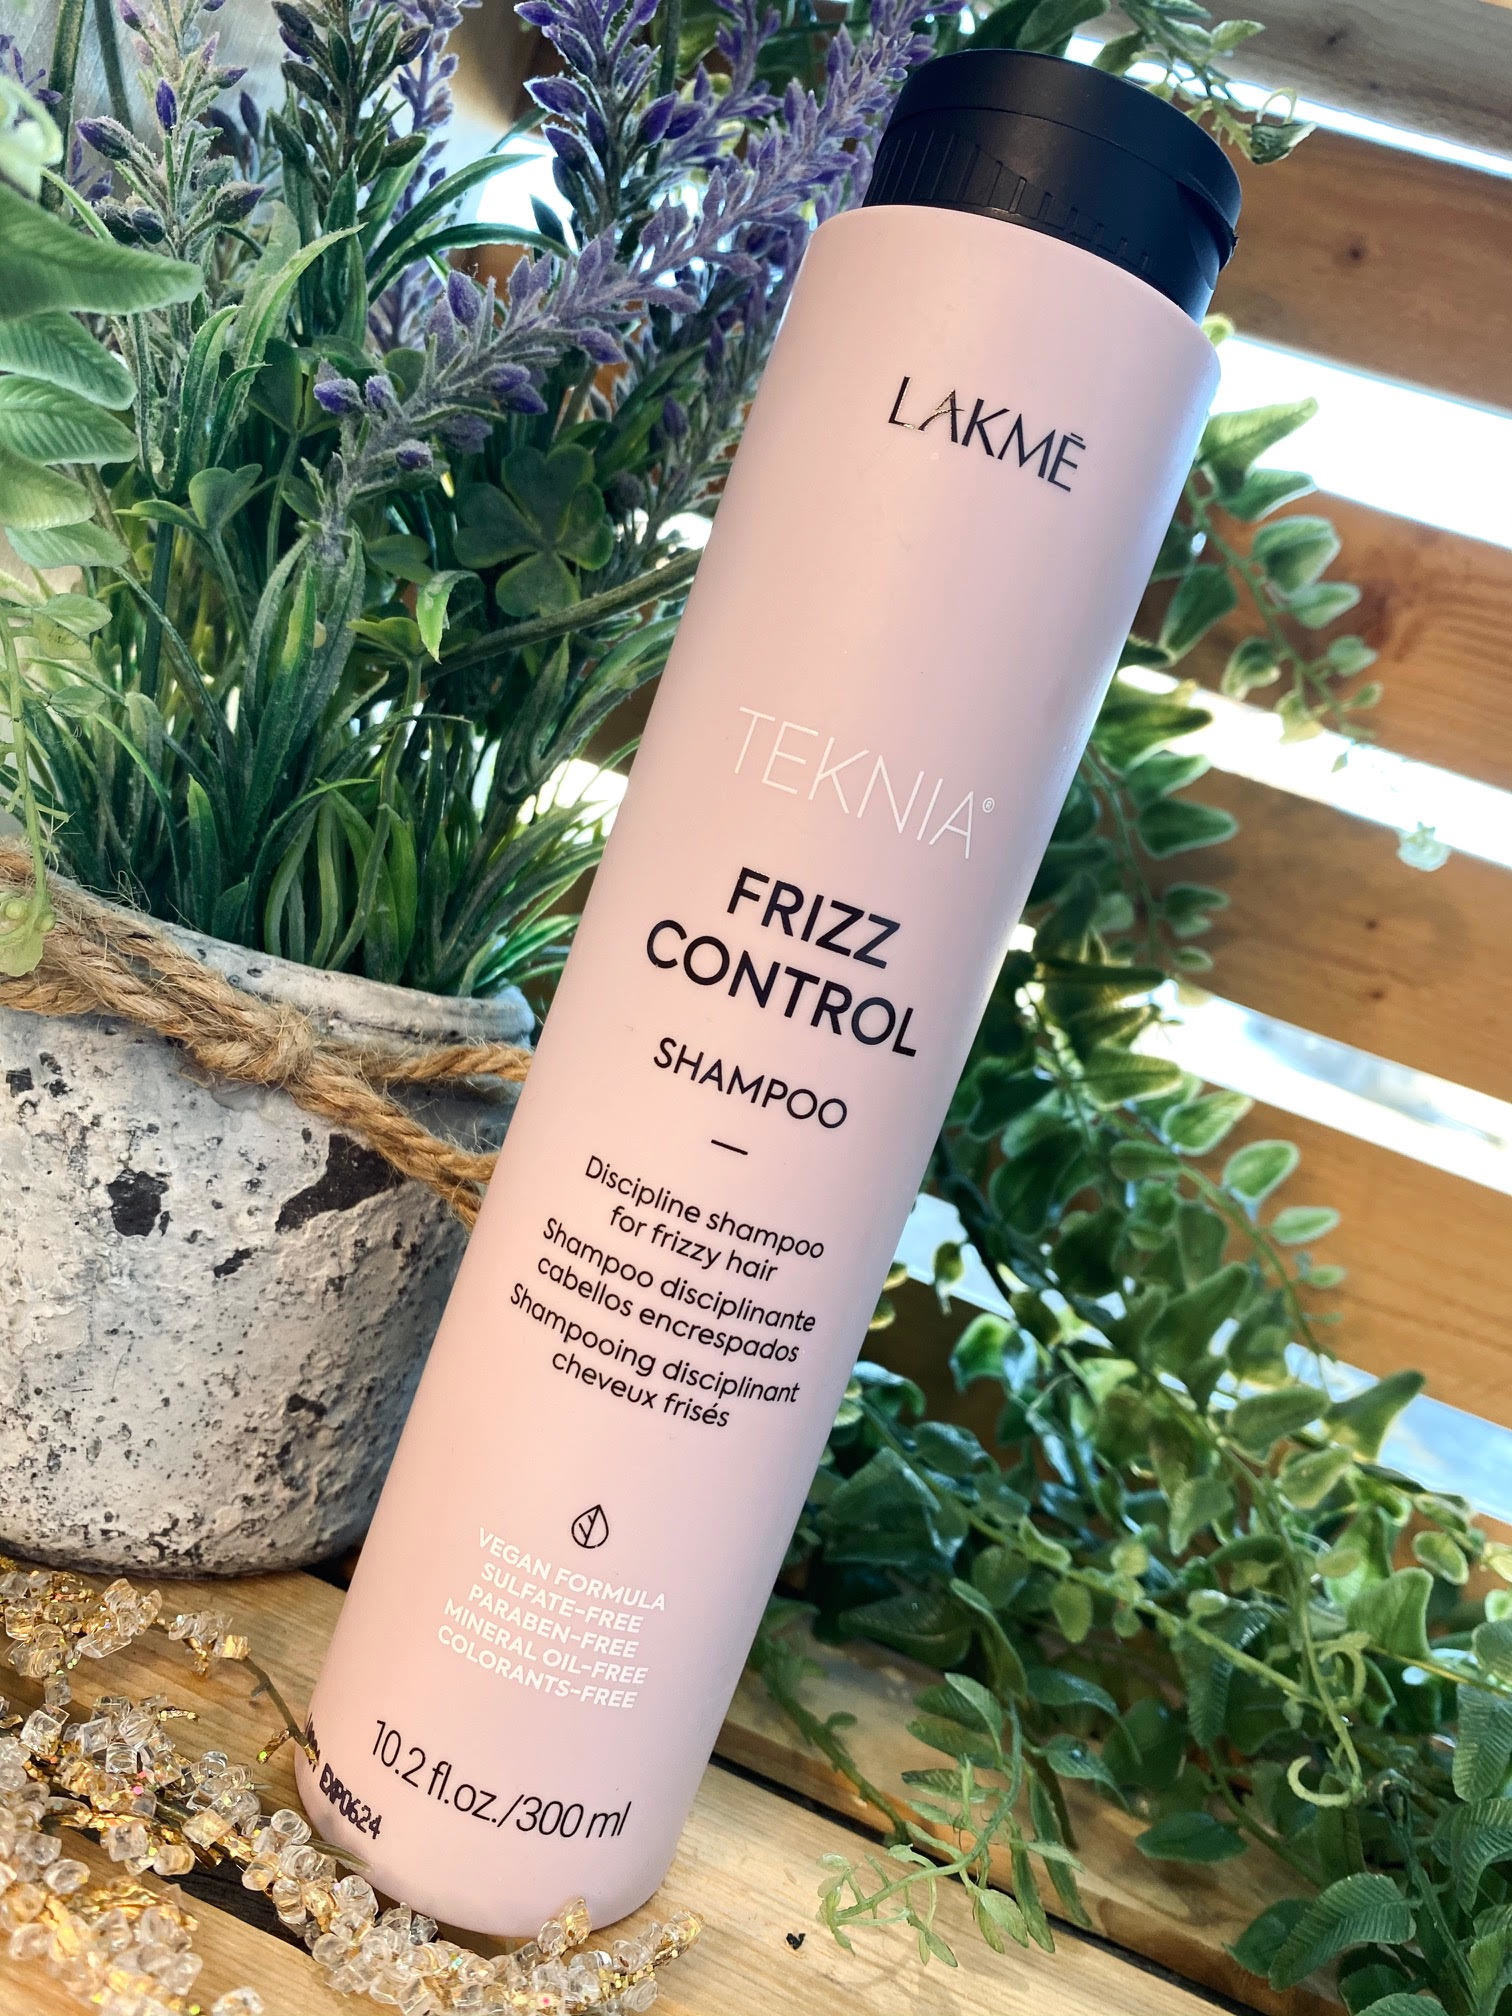 Lakmé TEKNIA frizz control shampooing 300ml